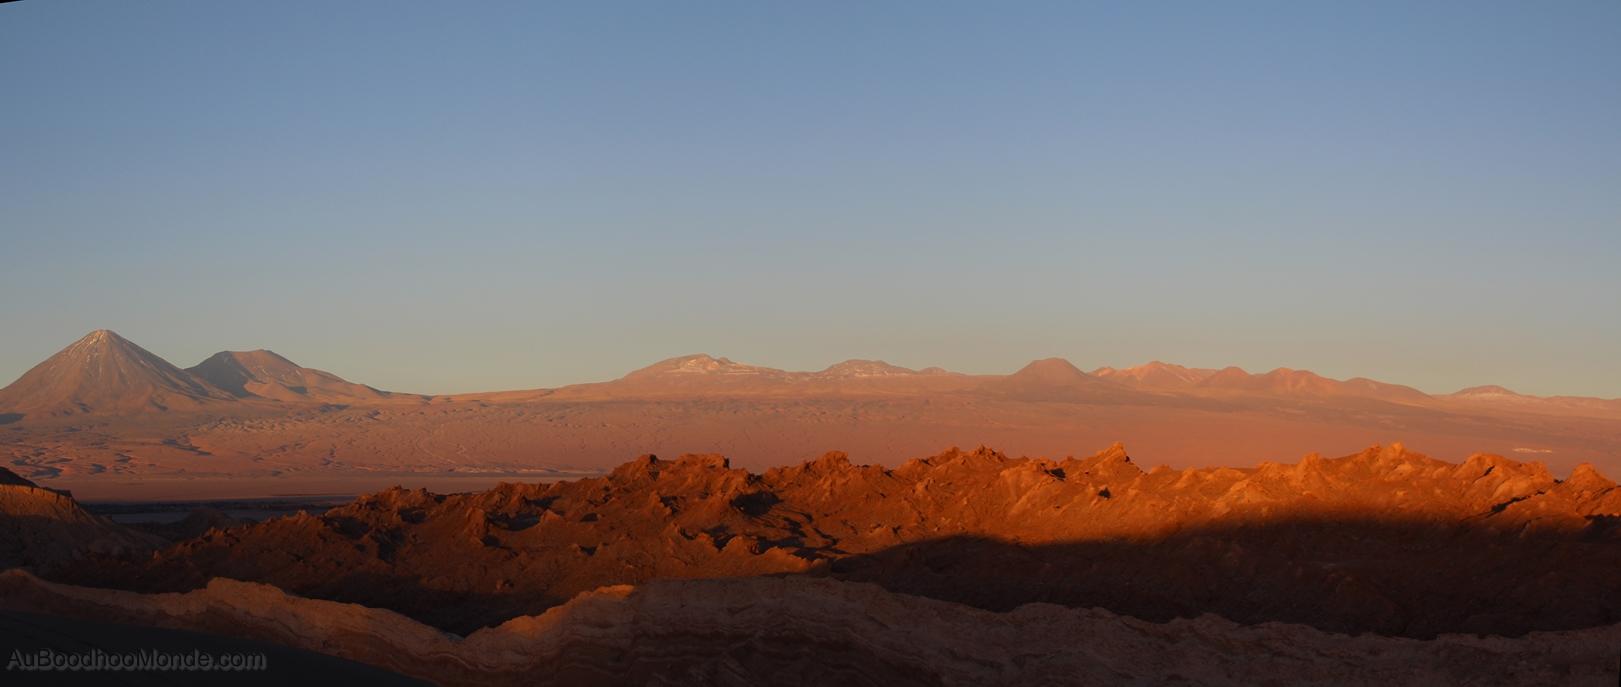 Chili - Vallee de la Luna Atacama desert